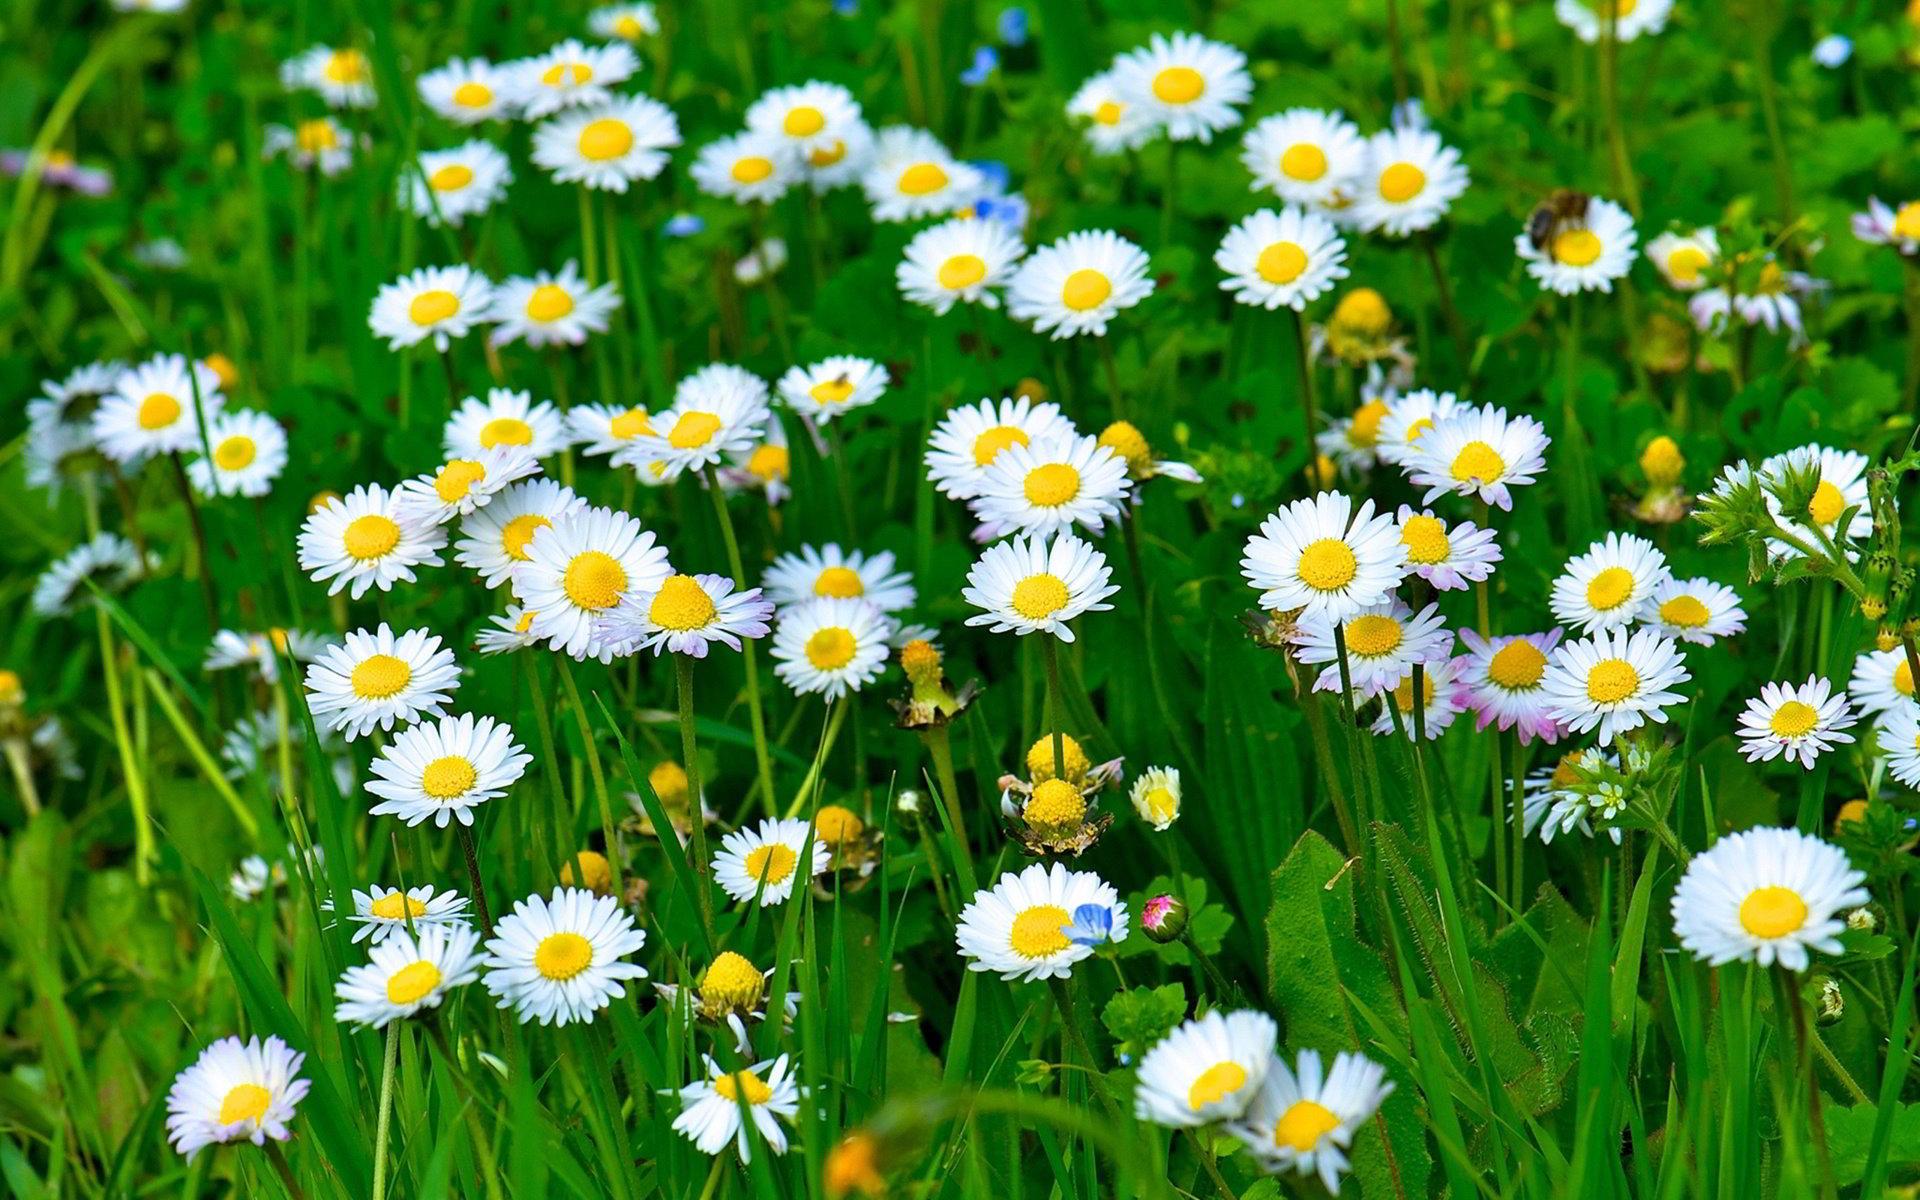 hinh anh hoa cuc dep 37